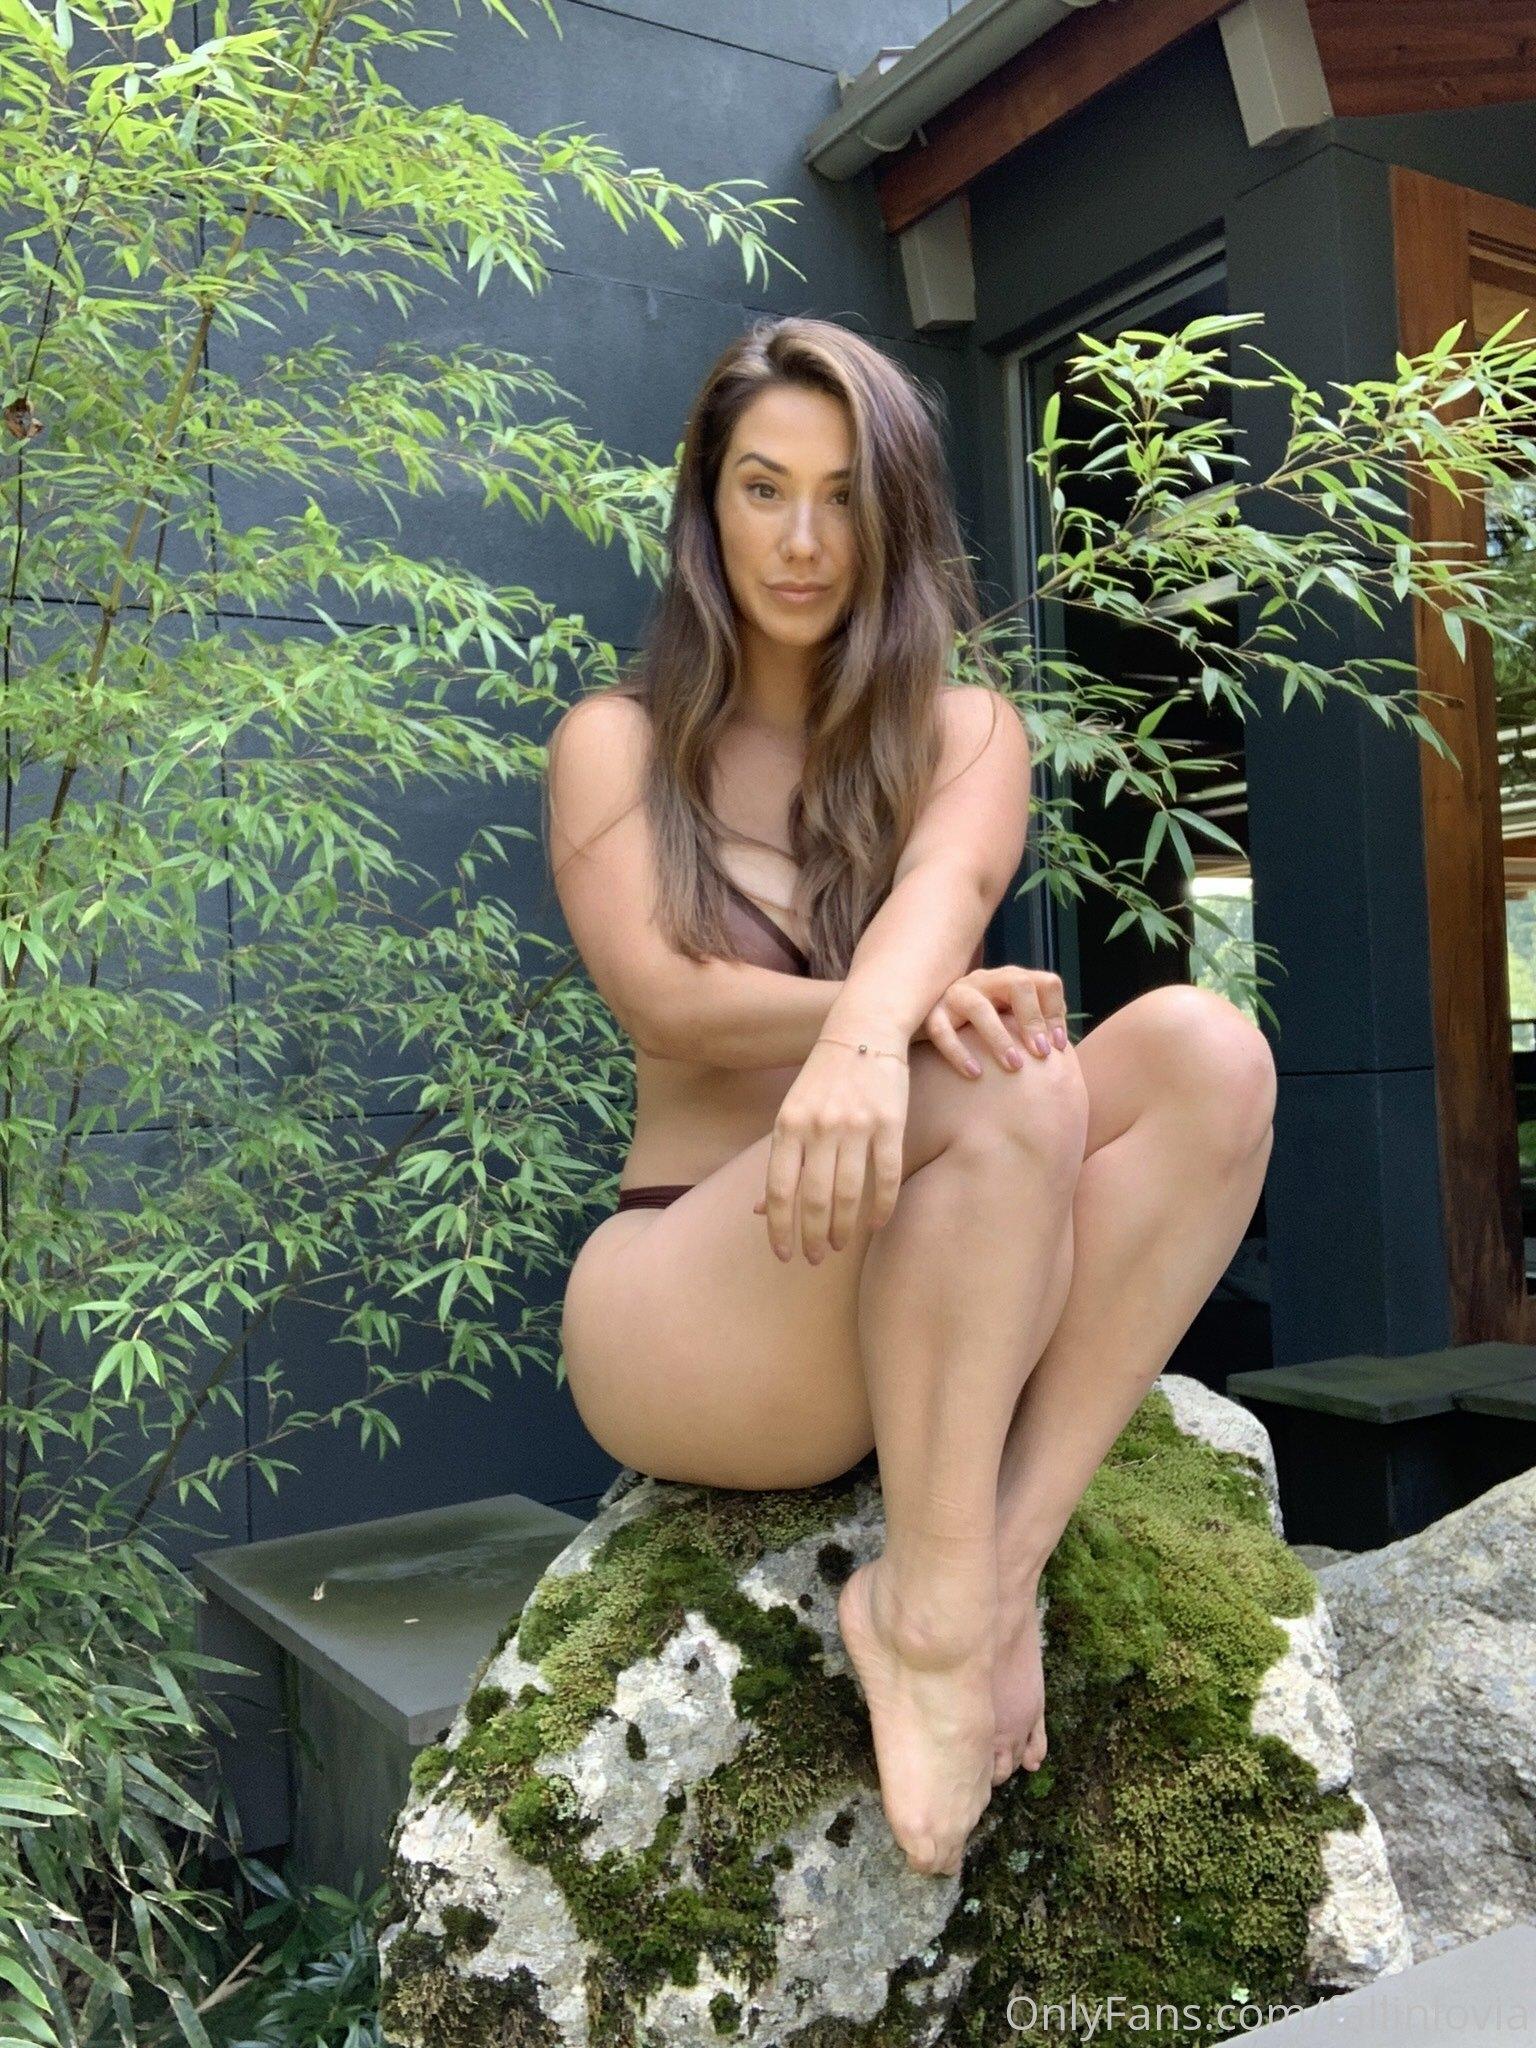 Eva Lovia, Fallinlovia, Onlyfans 0269